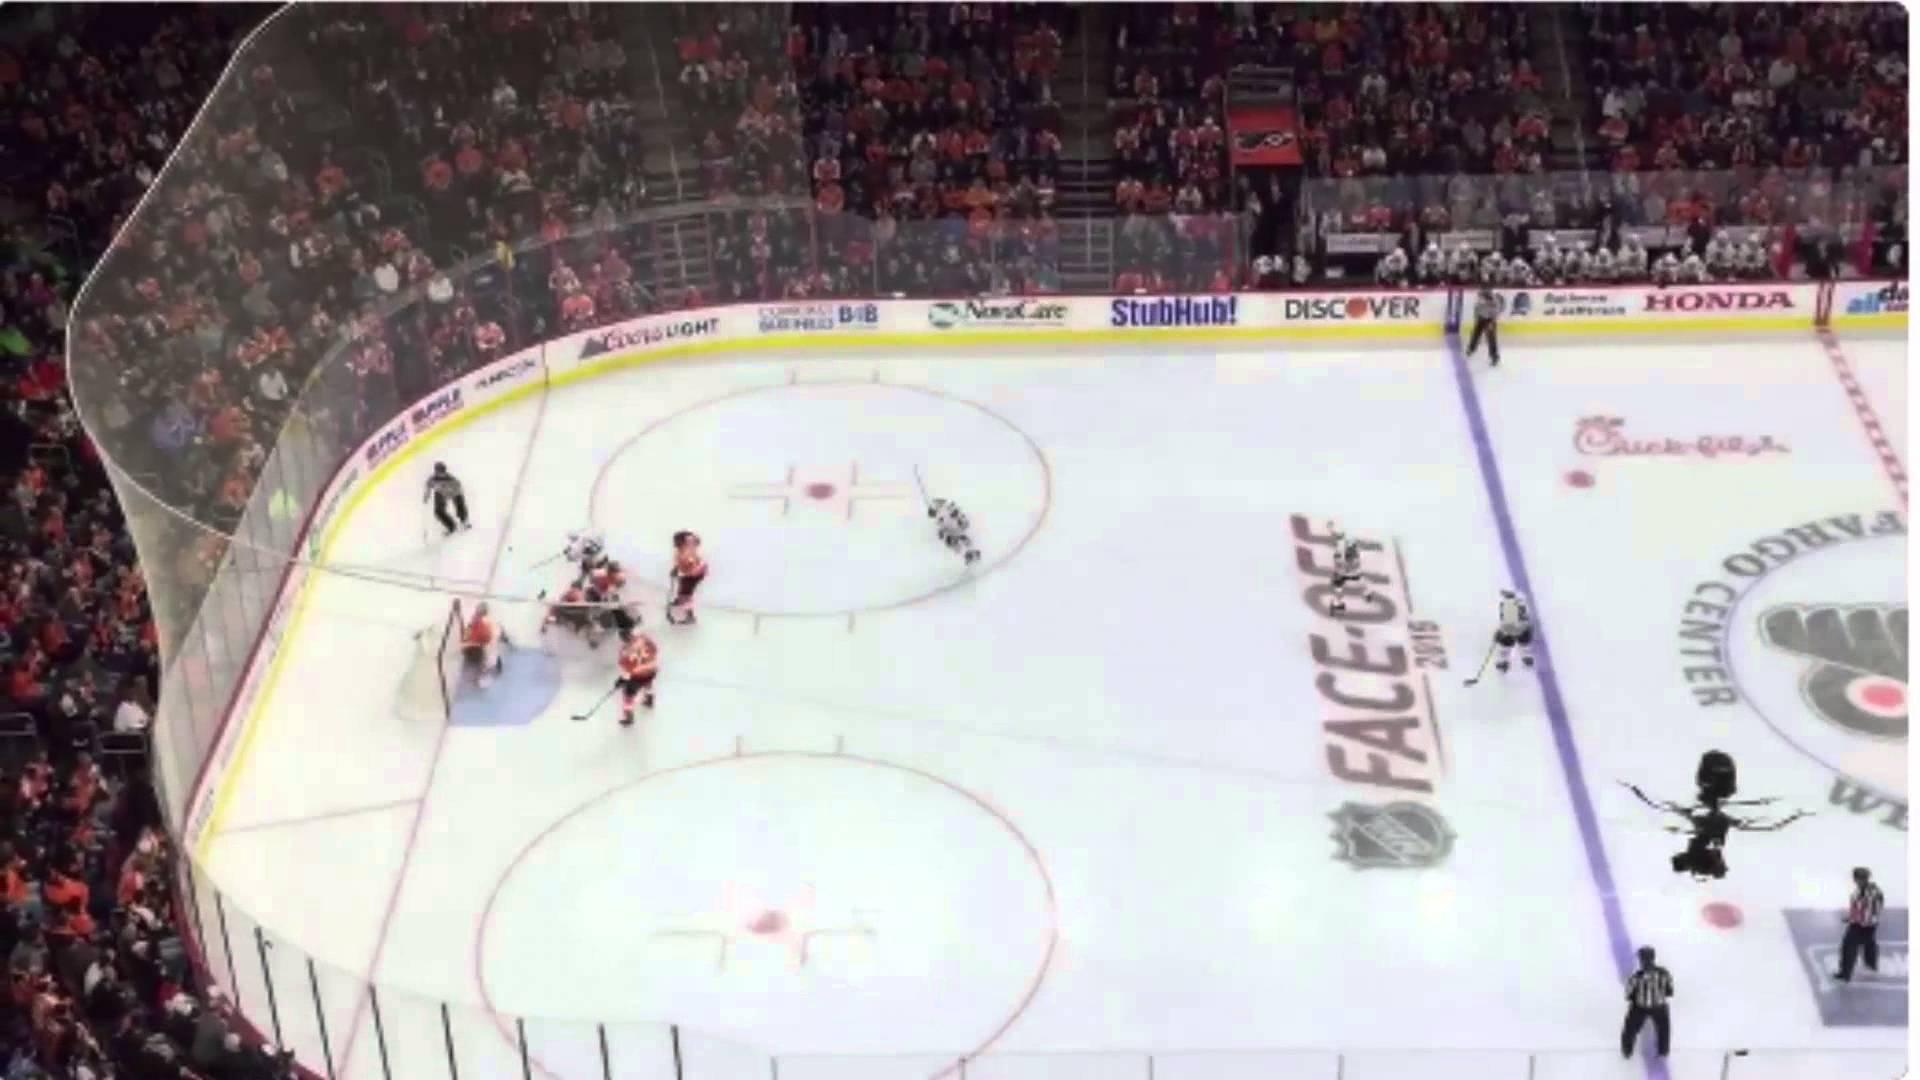 Savage: Philadelphia Flyers fans chant